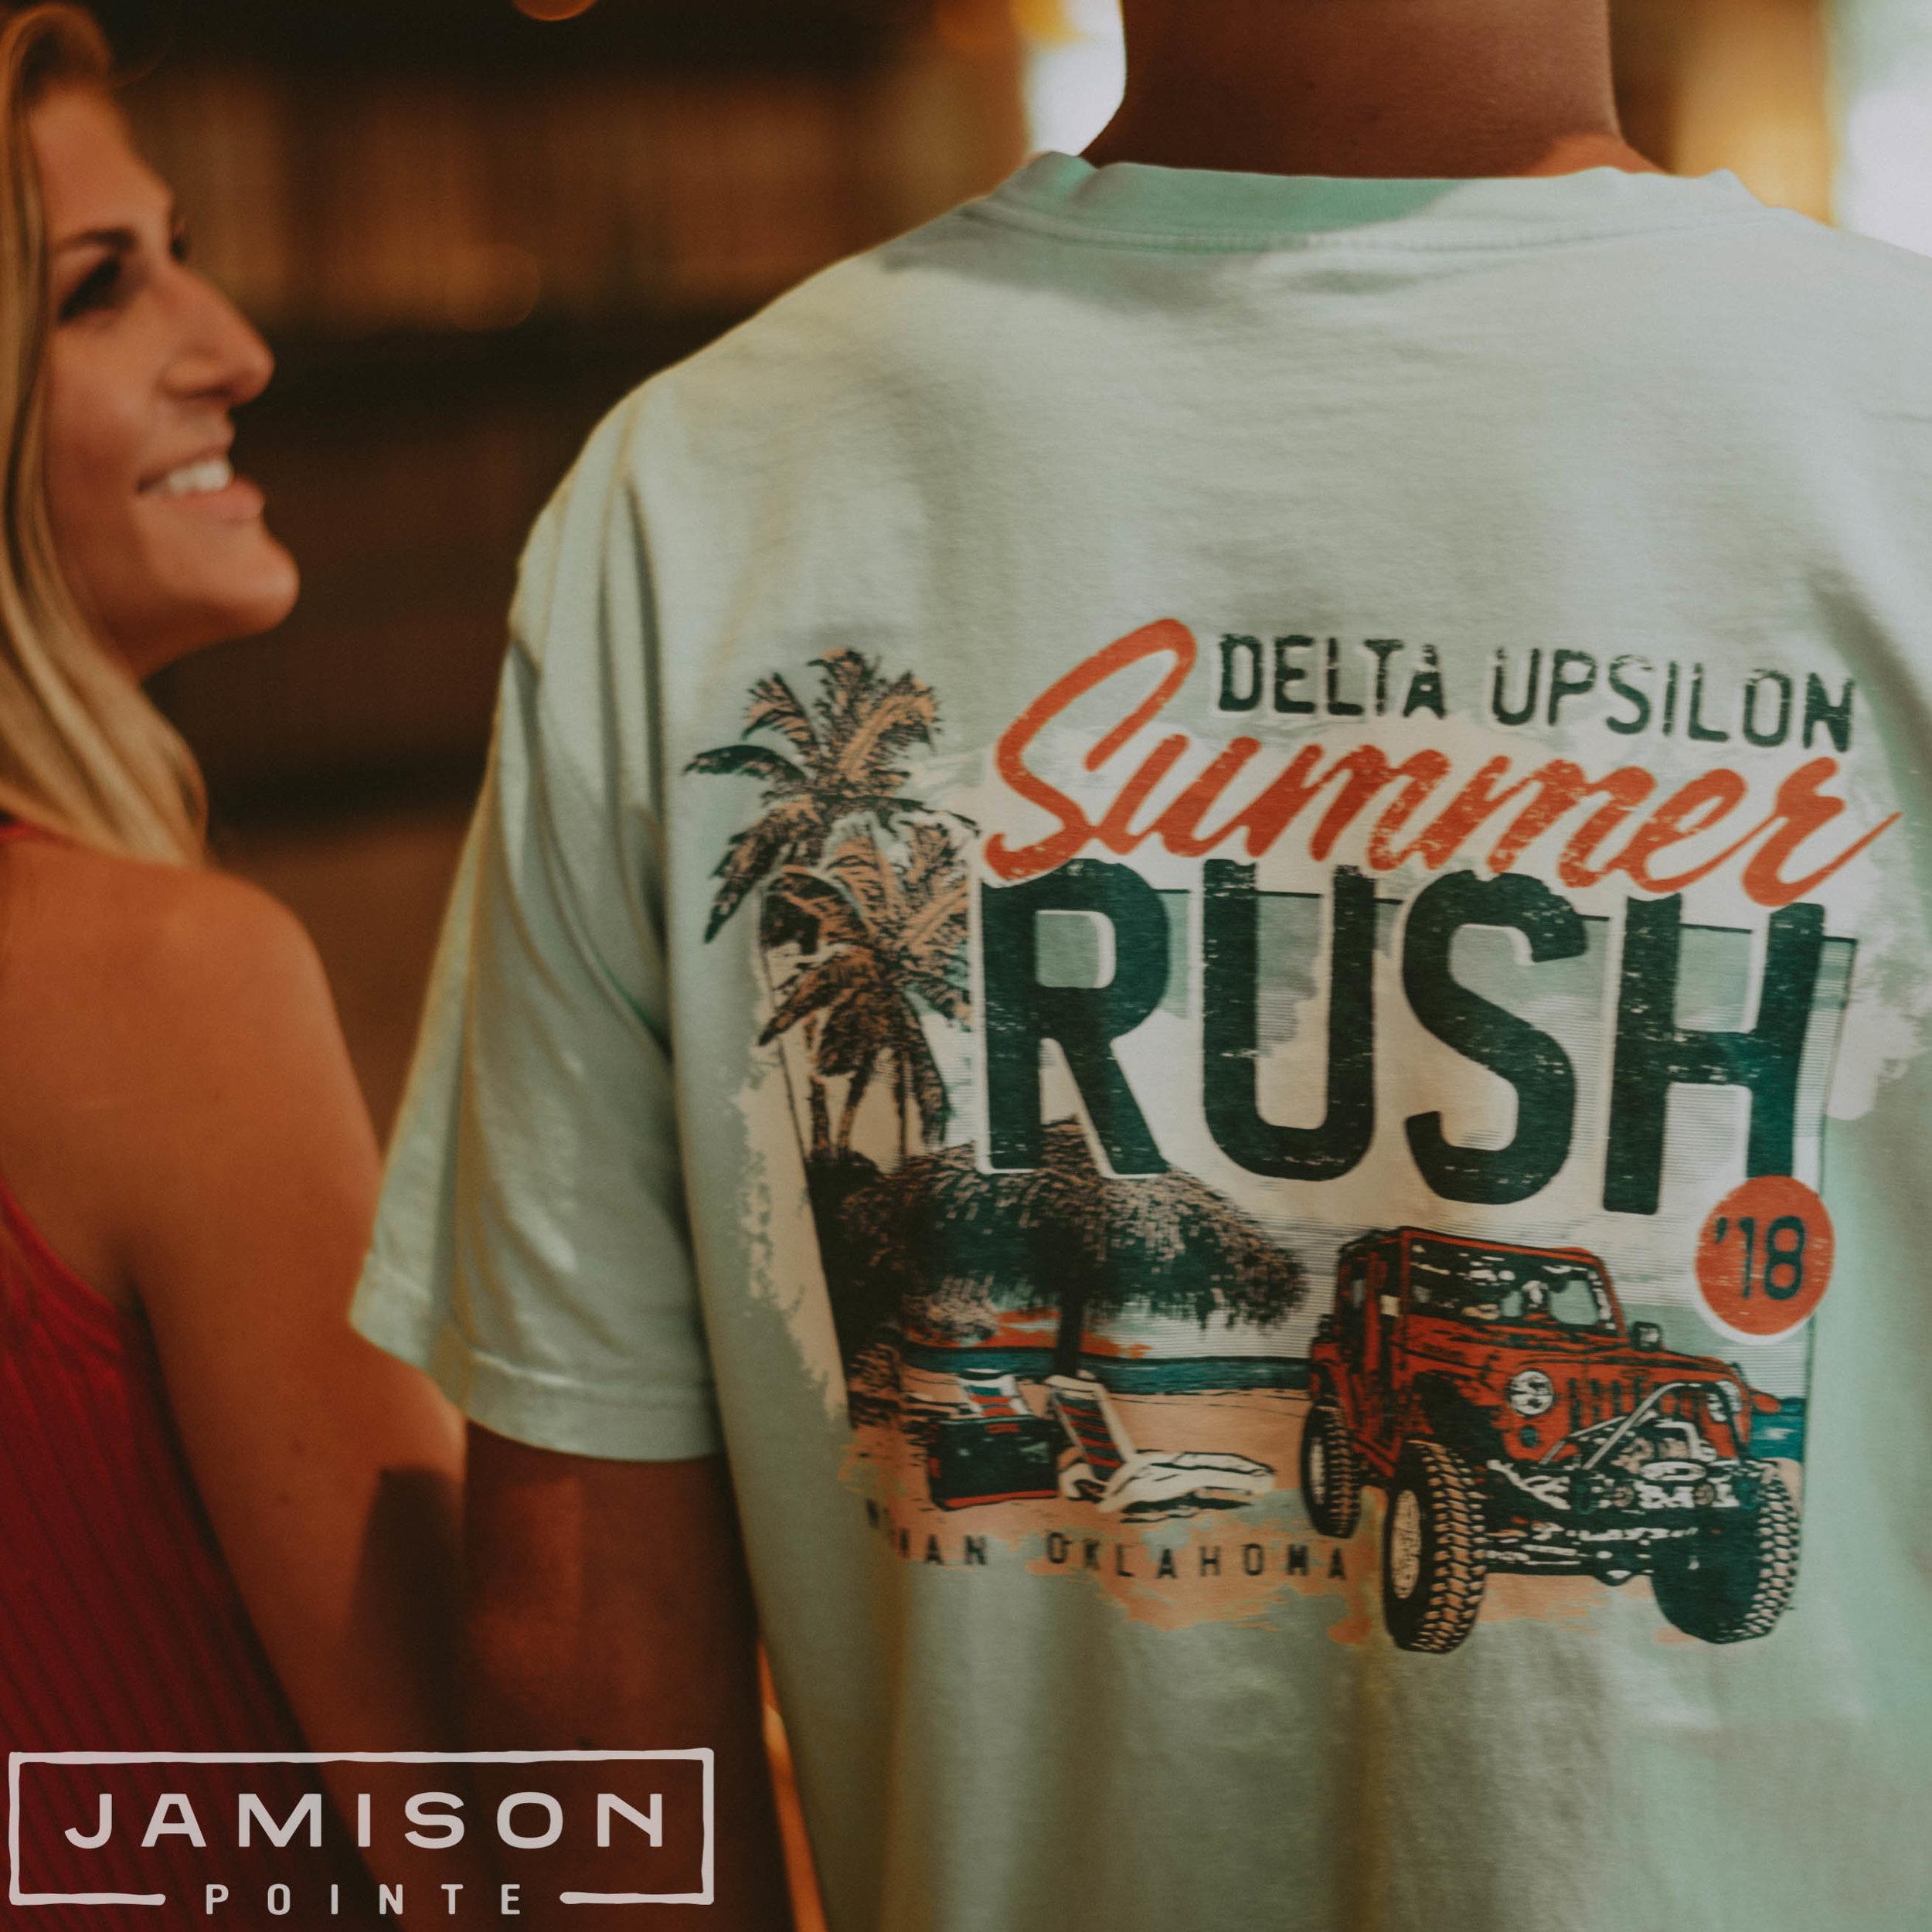 Delta Upsilon Summer Rush T-shirt